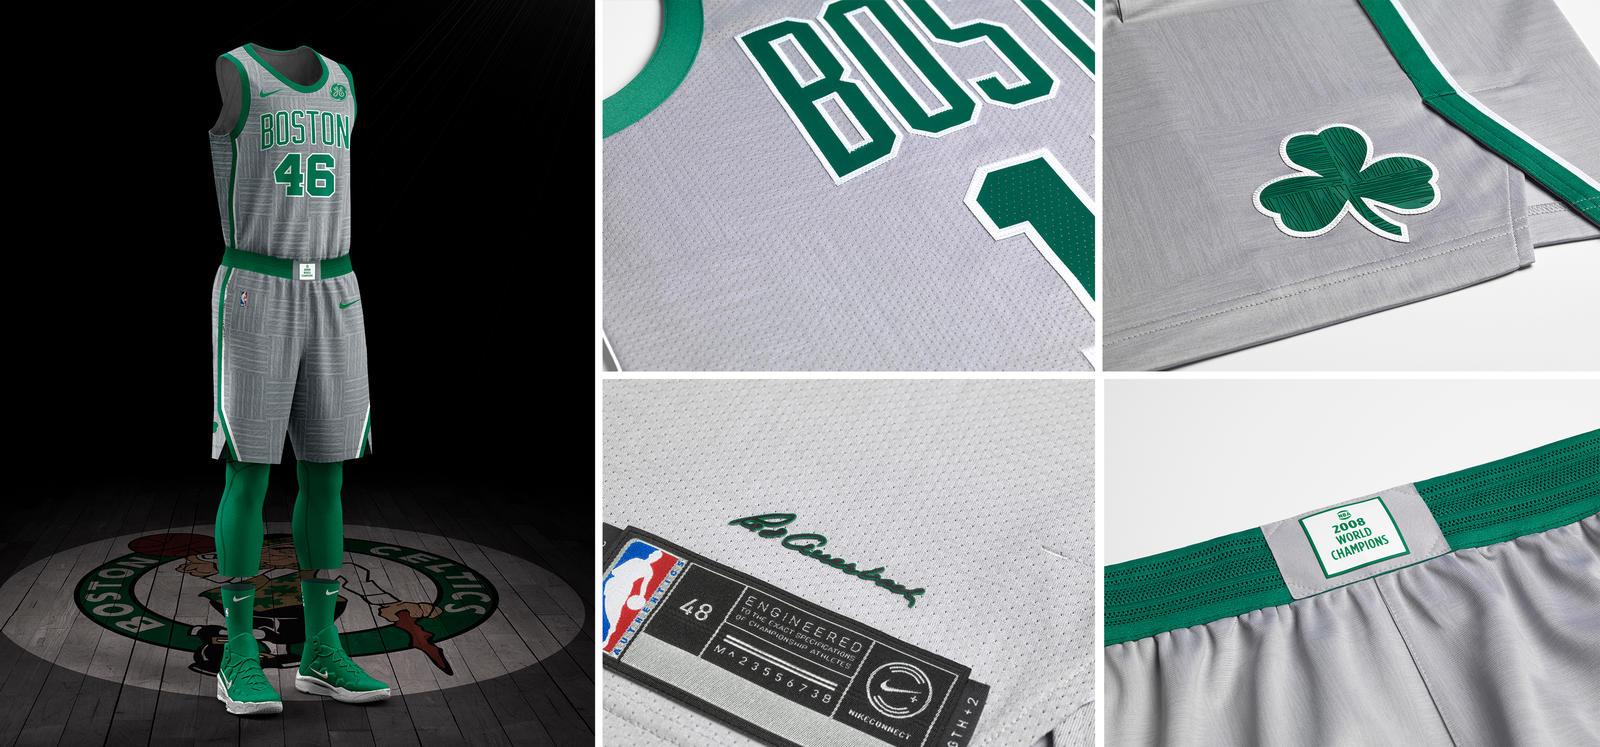 b9b7bc60ea1 Nike NBA City Edition Jerseys